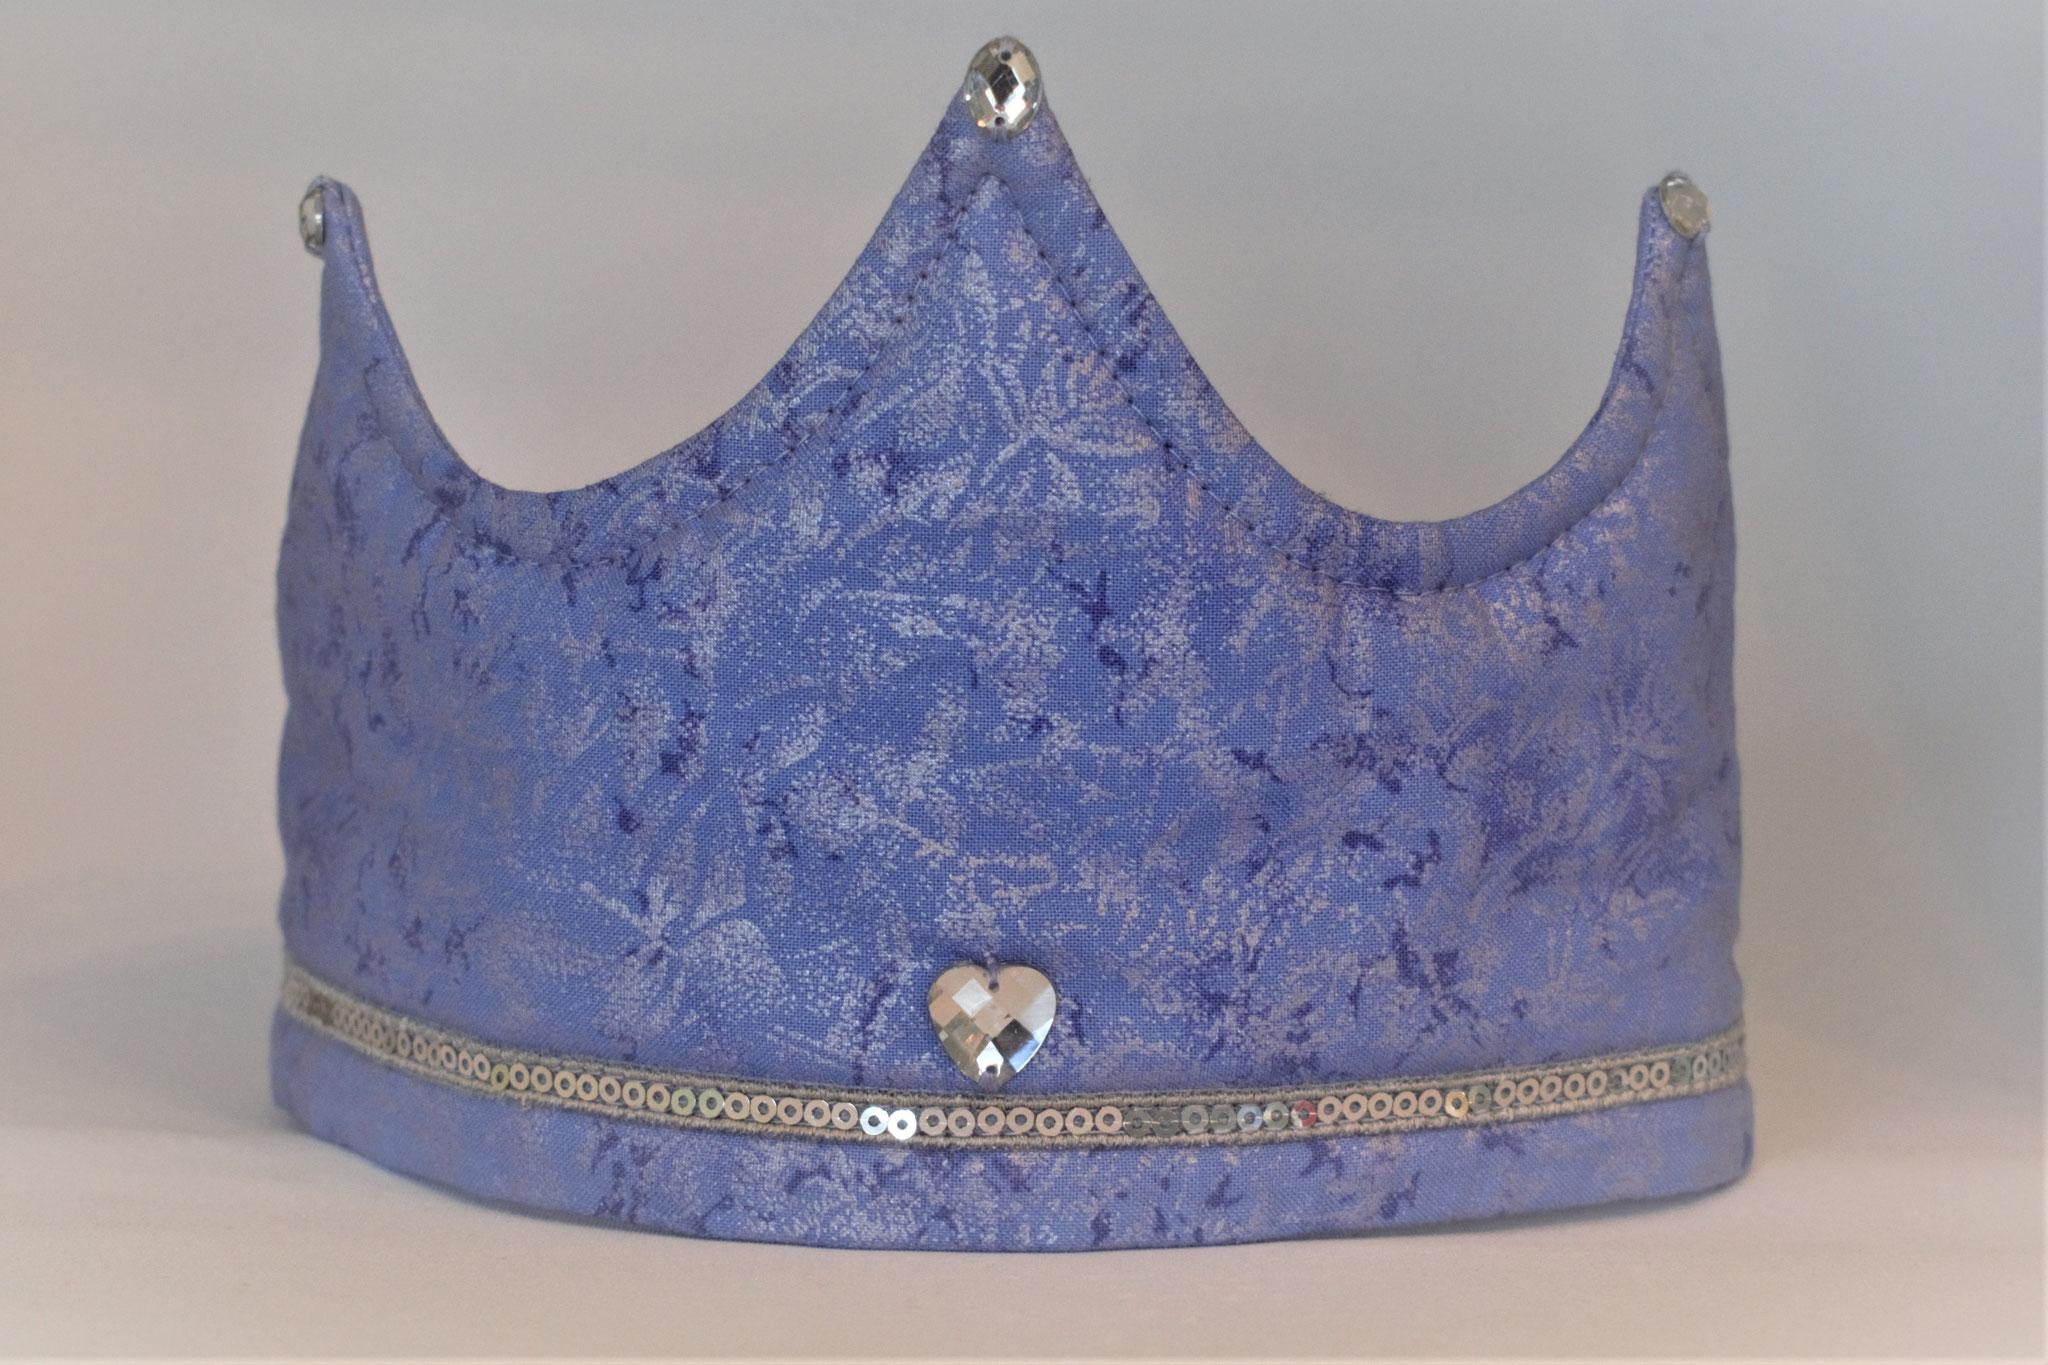 hellblau mit Glitzerbordüre, 17,50€